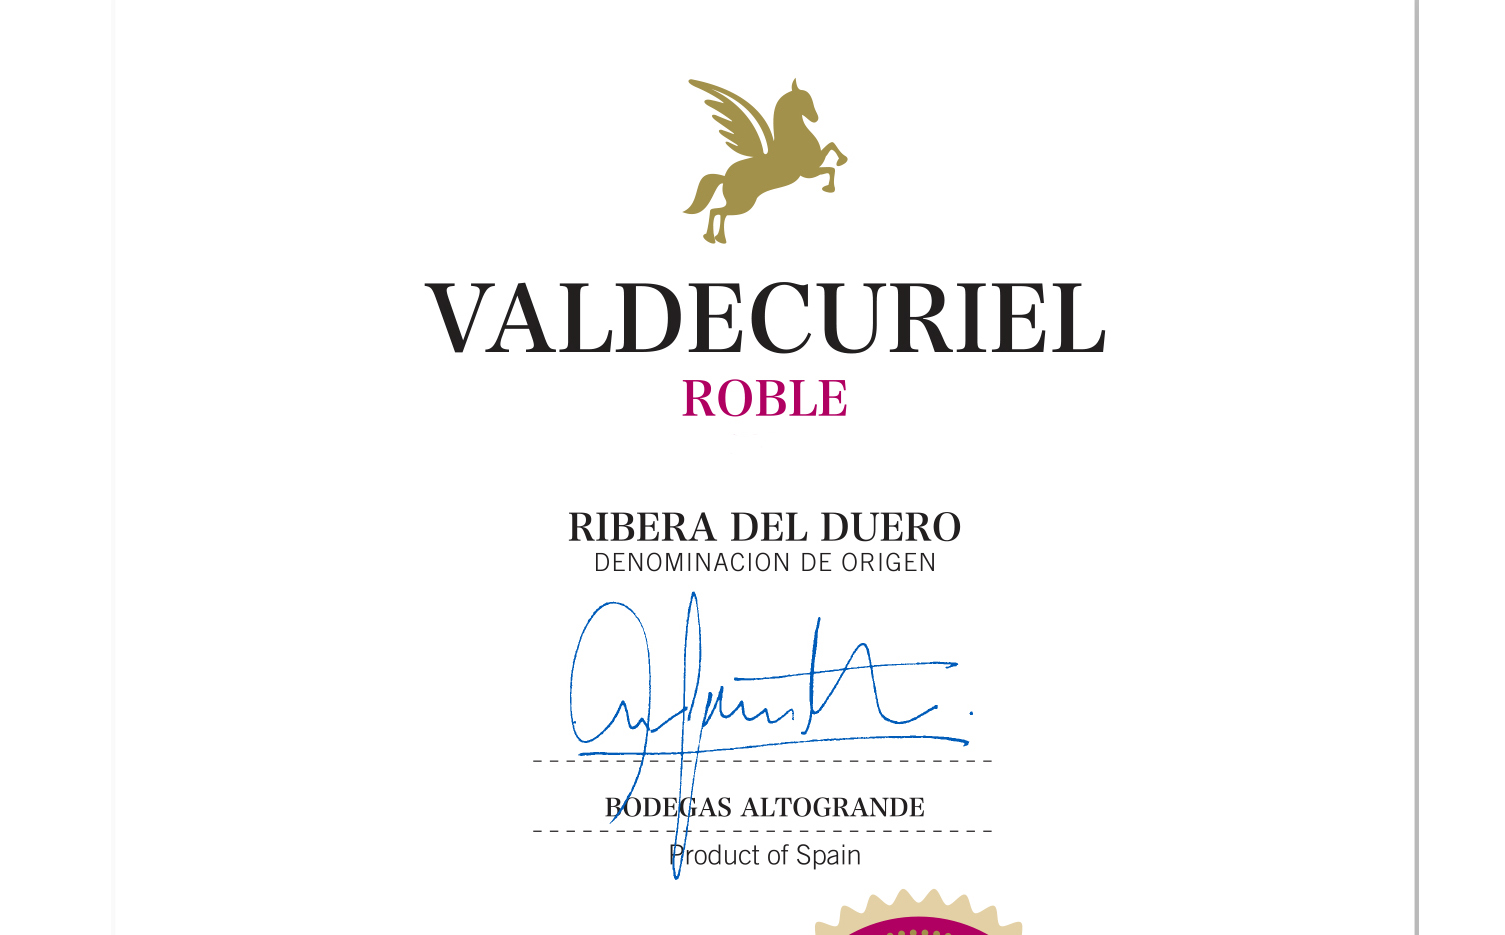 Valdecuriel Roble 2016